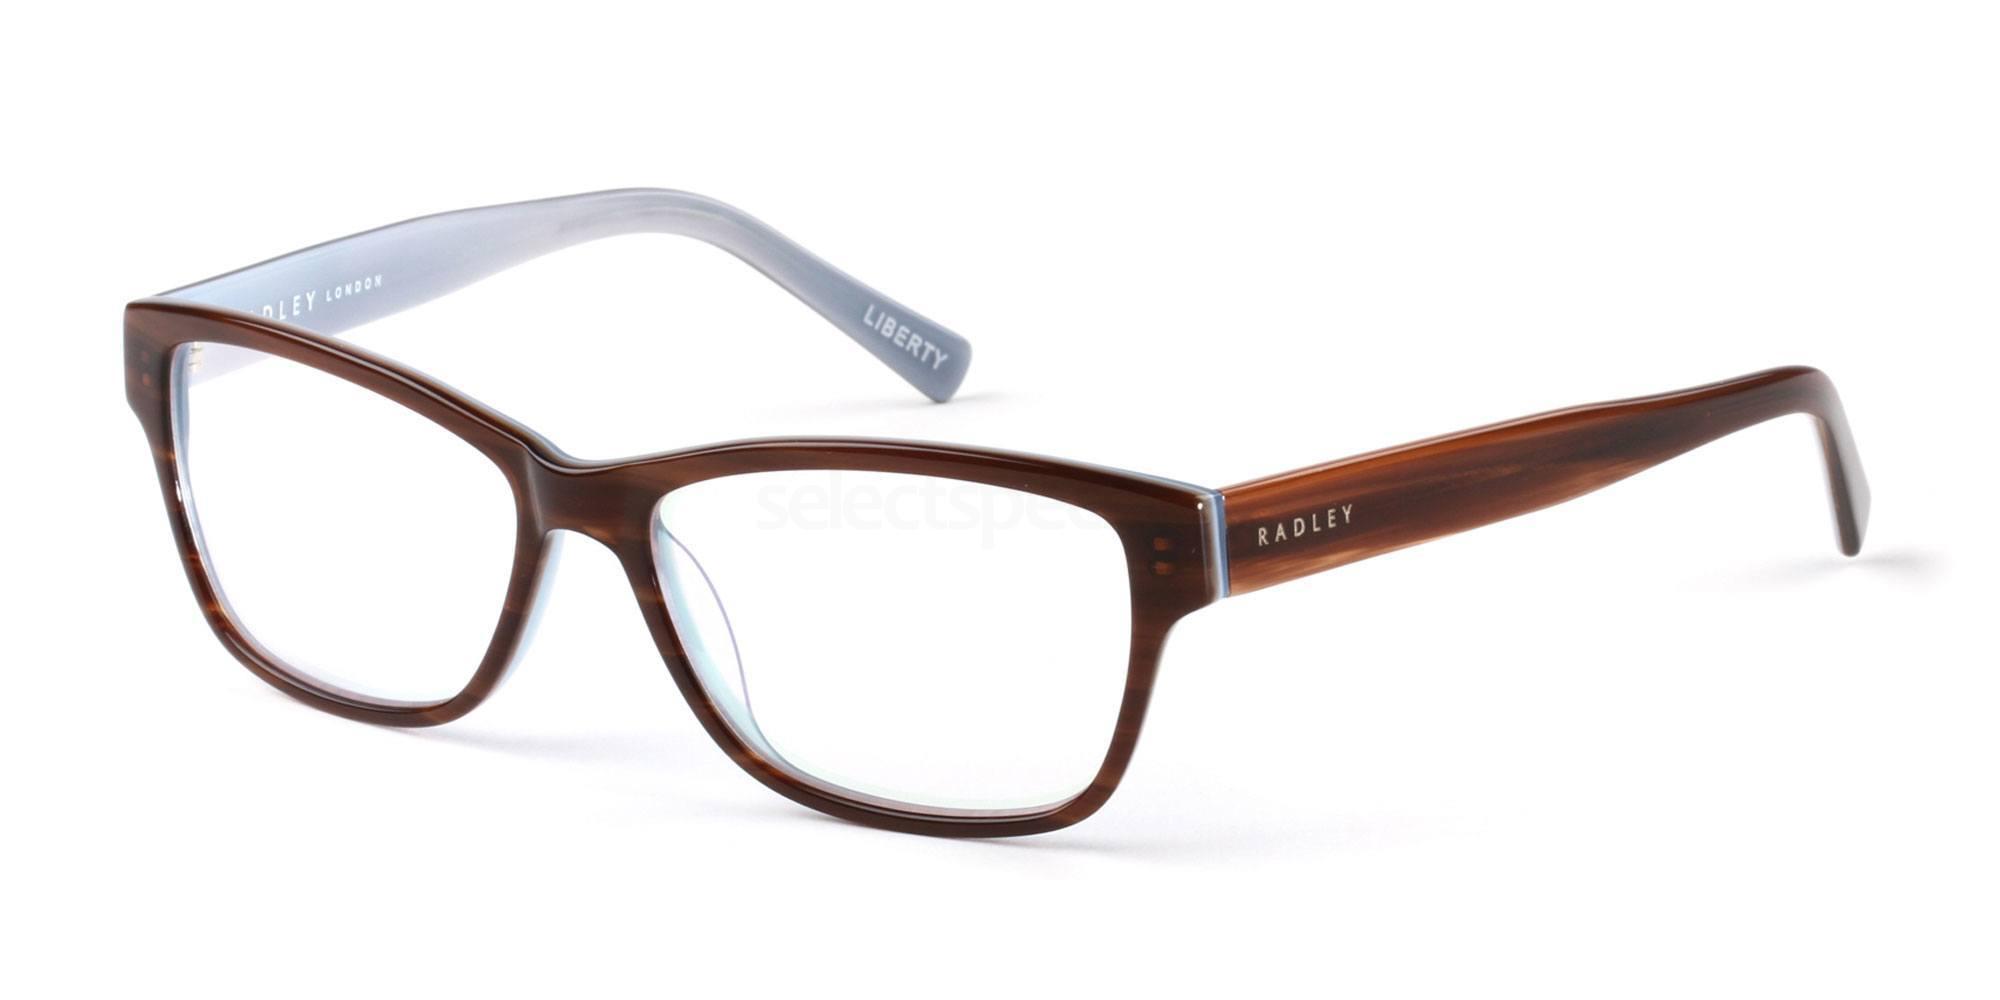 101 RDO-LIBERTY Glasses, Radley London